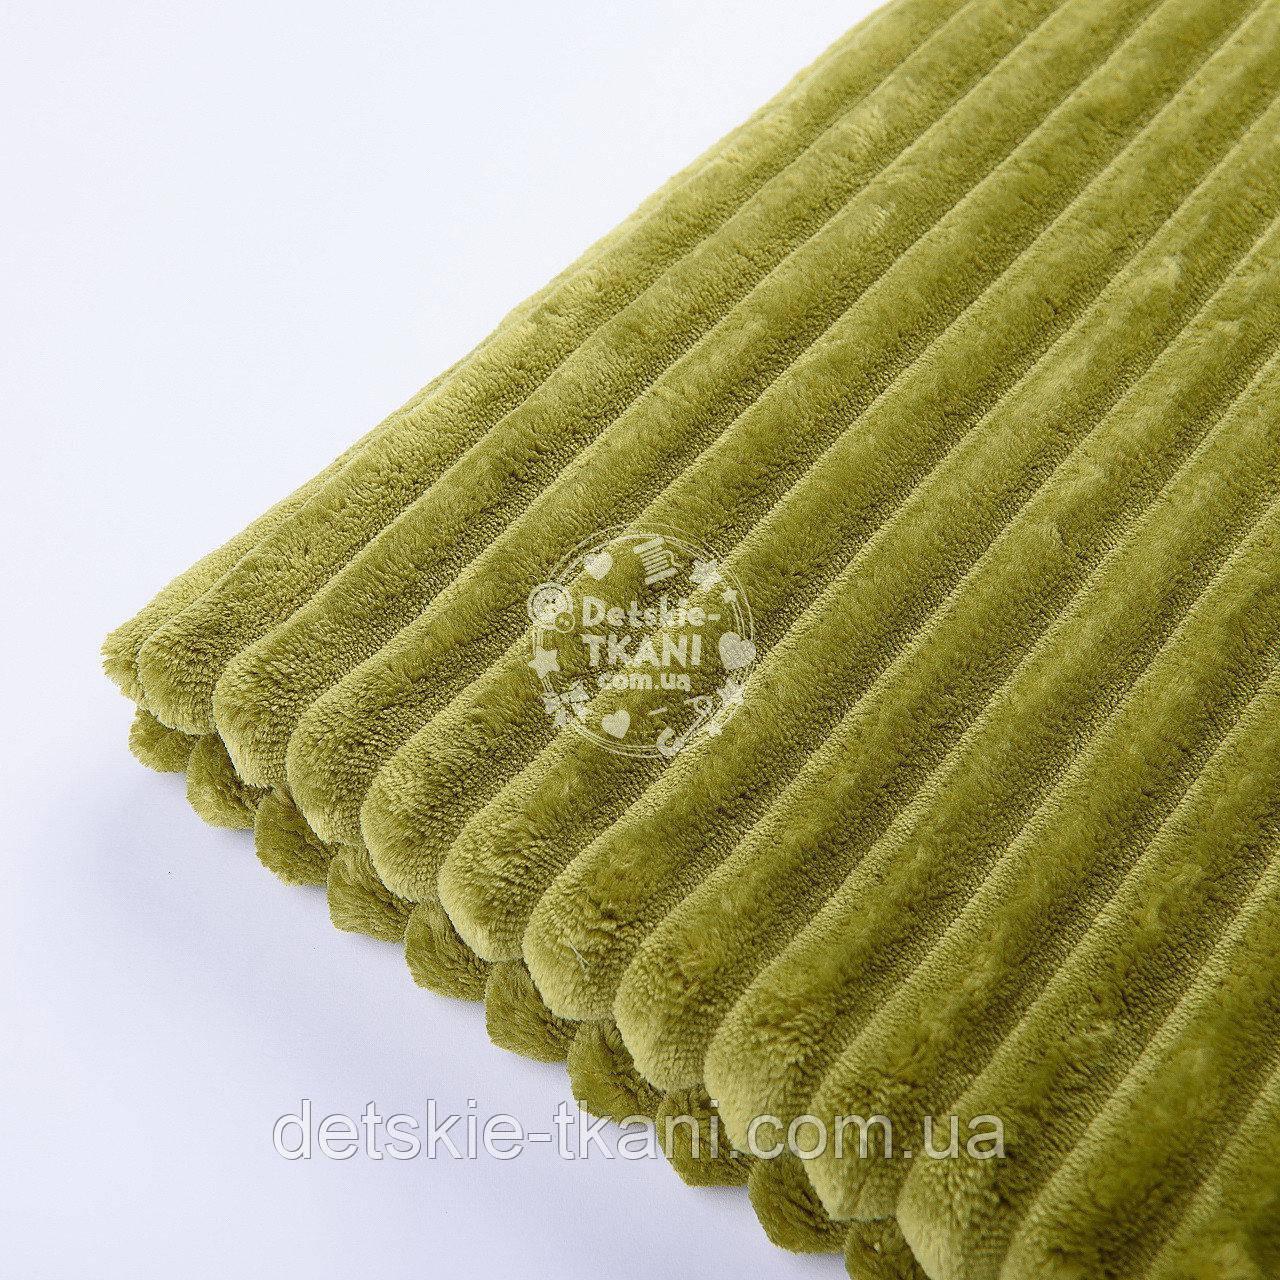 Лоскут плюша в полоску Stripes тёмно-оливкового цвета 40*160 см